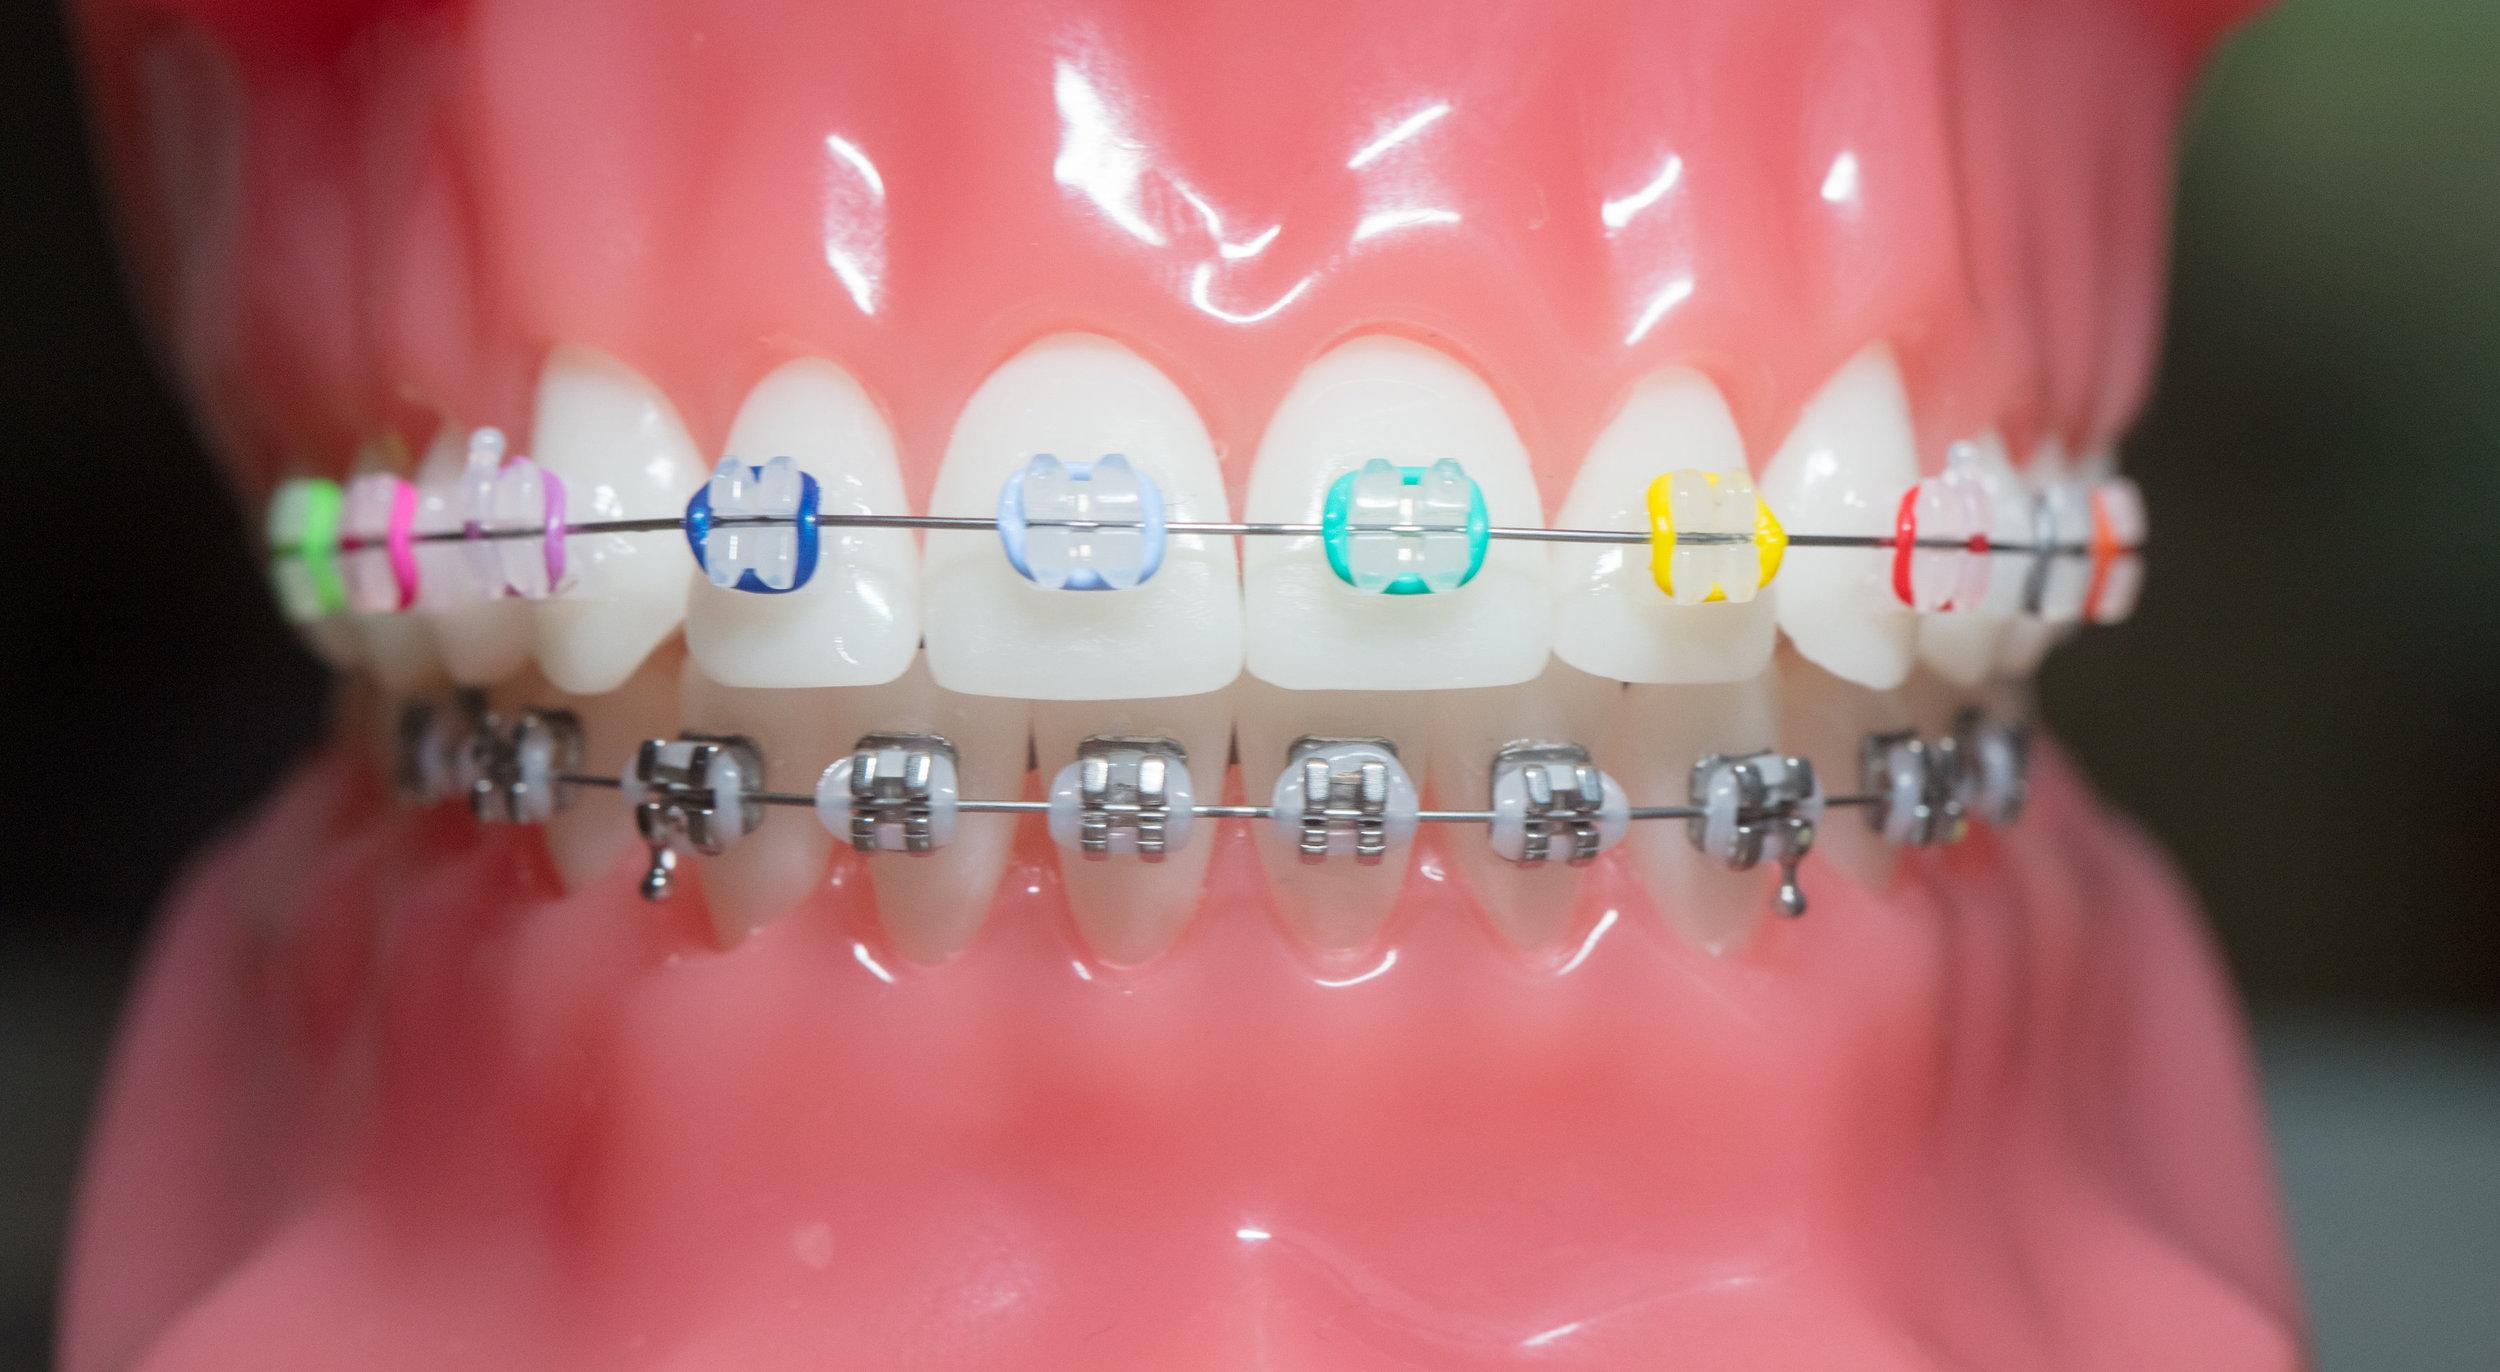 Samuelson Orthodontics - larity™ ADVANCED Ceramic Brackets with Color